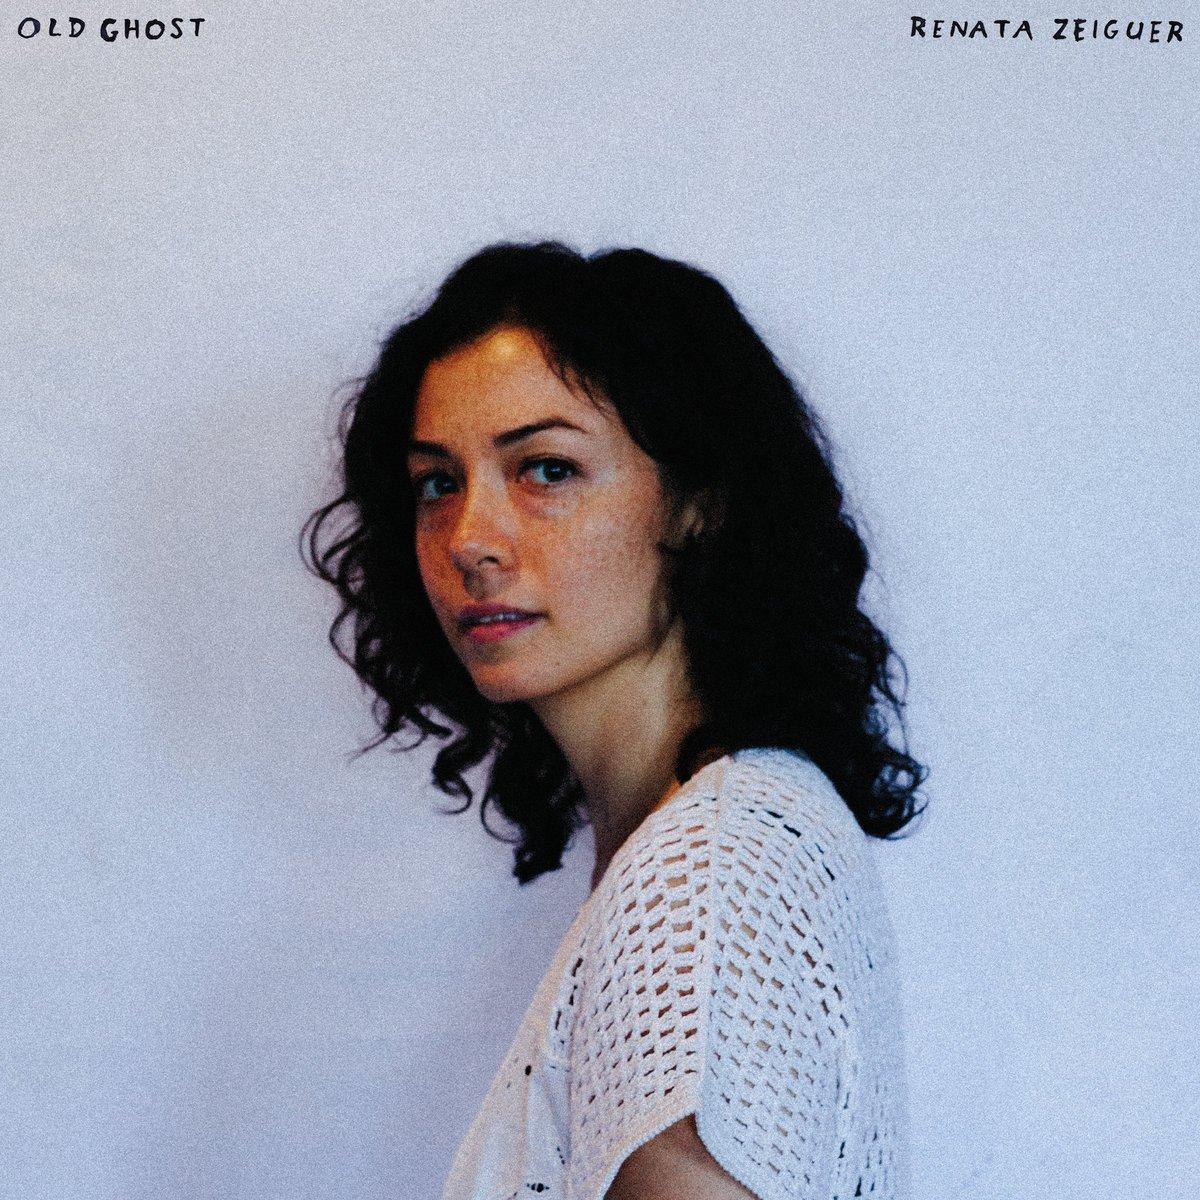 Listen to @RenataZeiguer's gorgeously foreboding new song 'Follow Me Down' https://t.co/cTxSx2L7tZ https://t.co/Mc44plc2uv